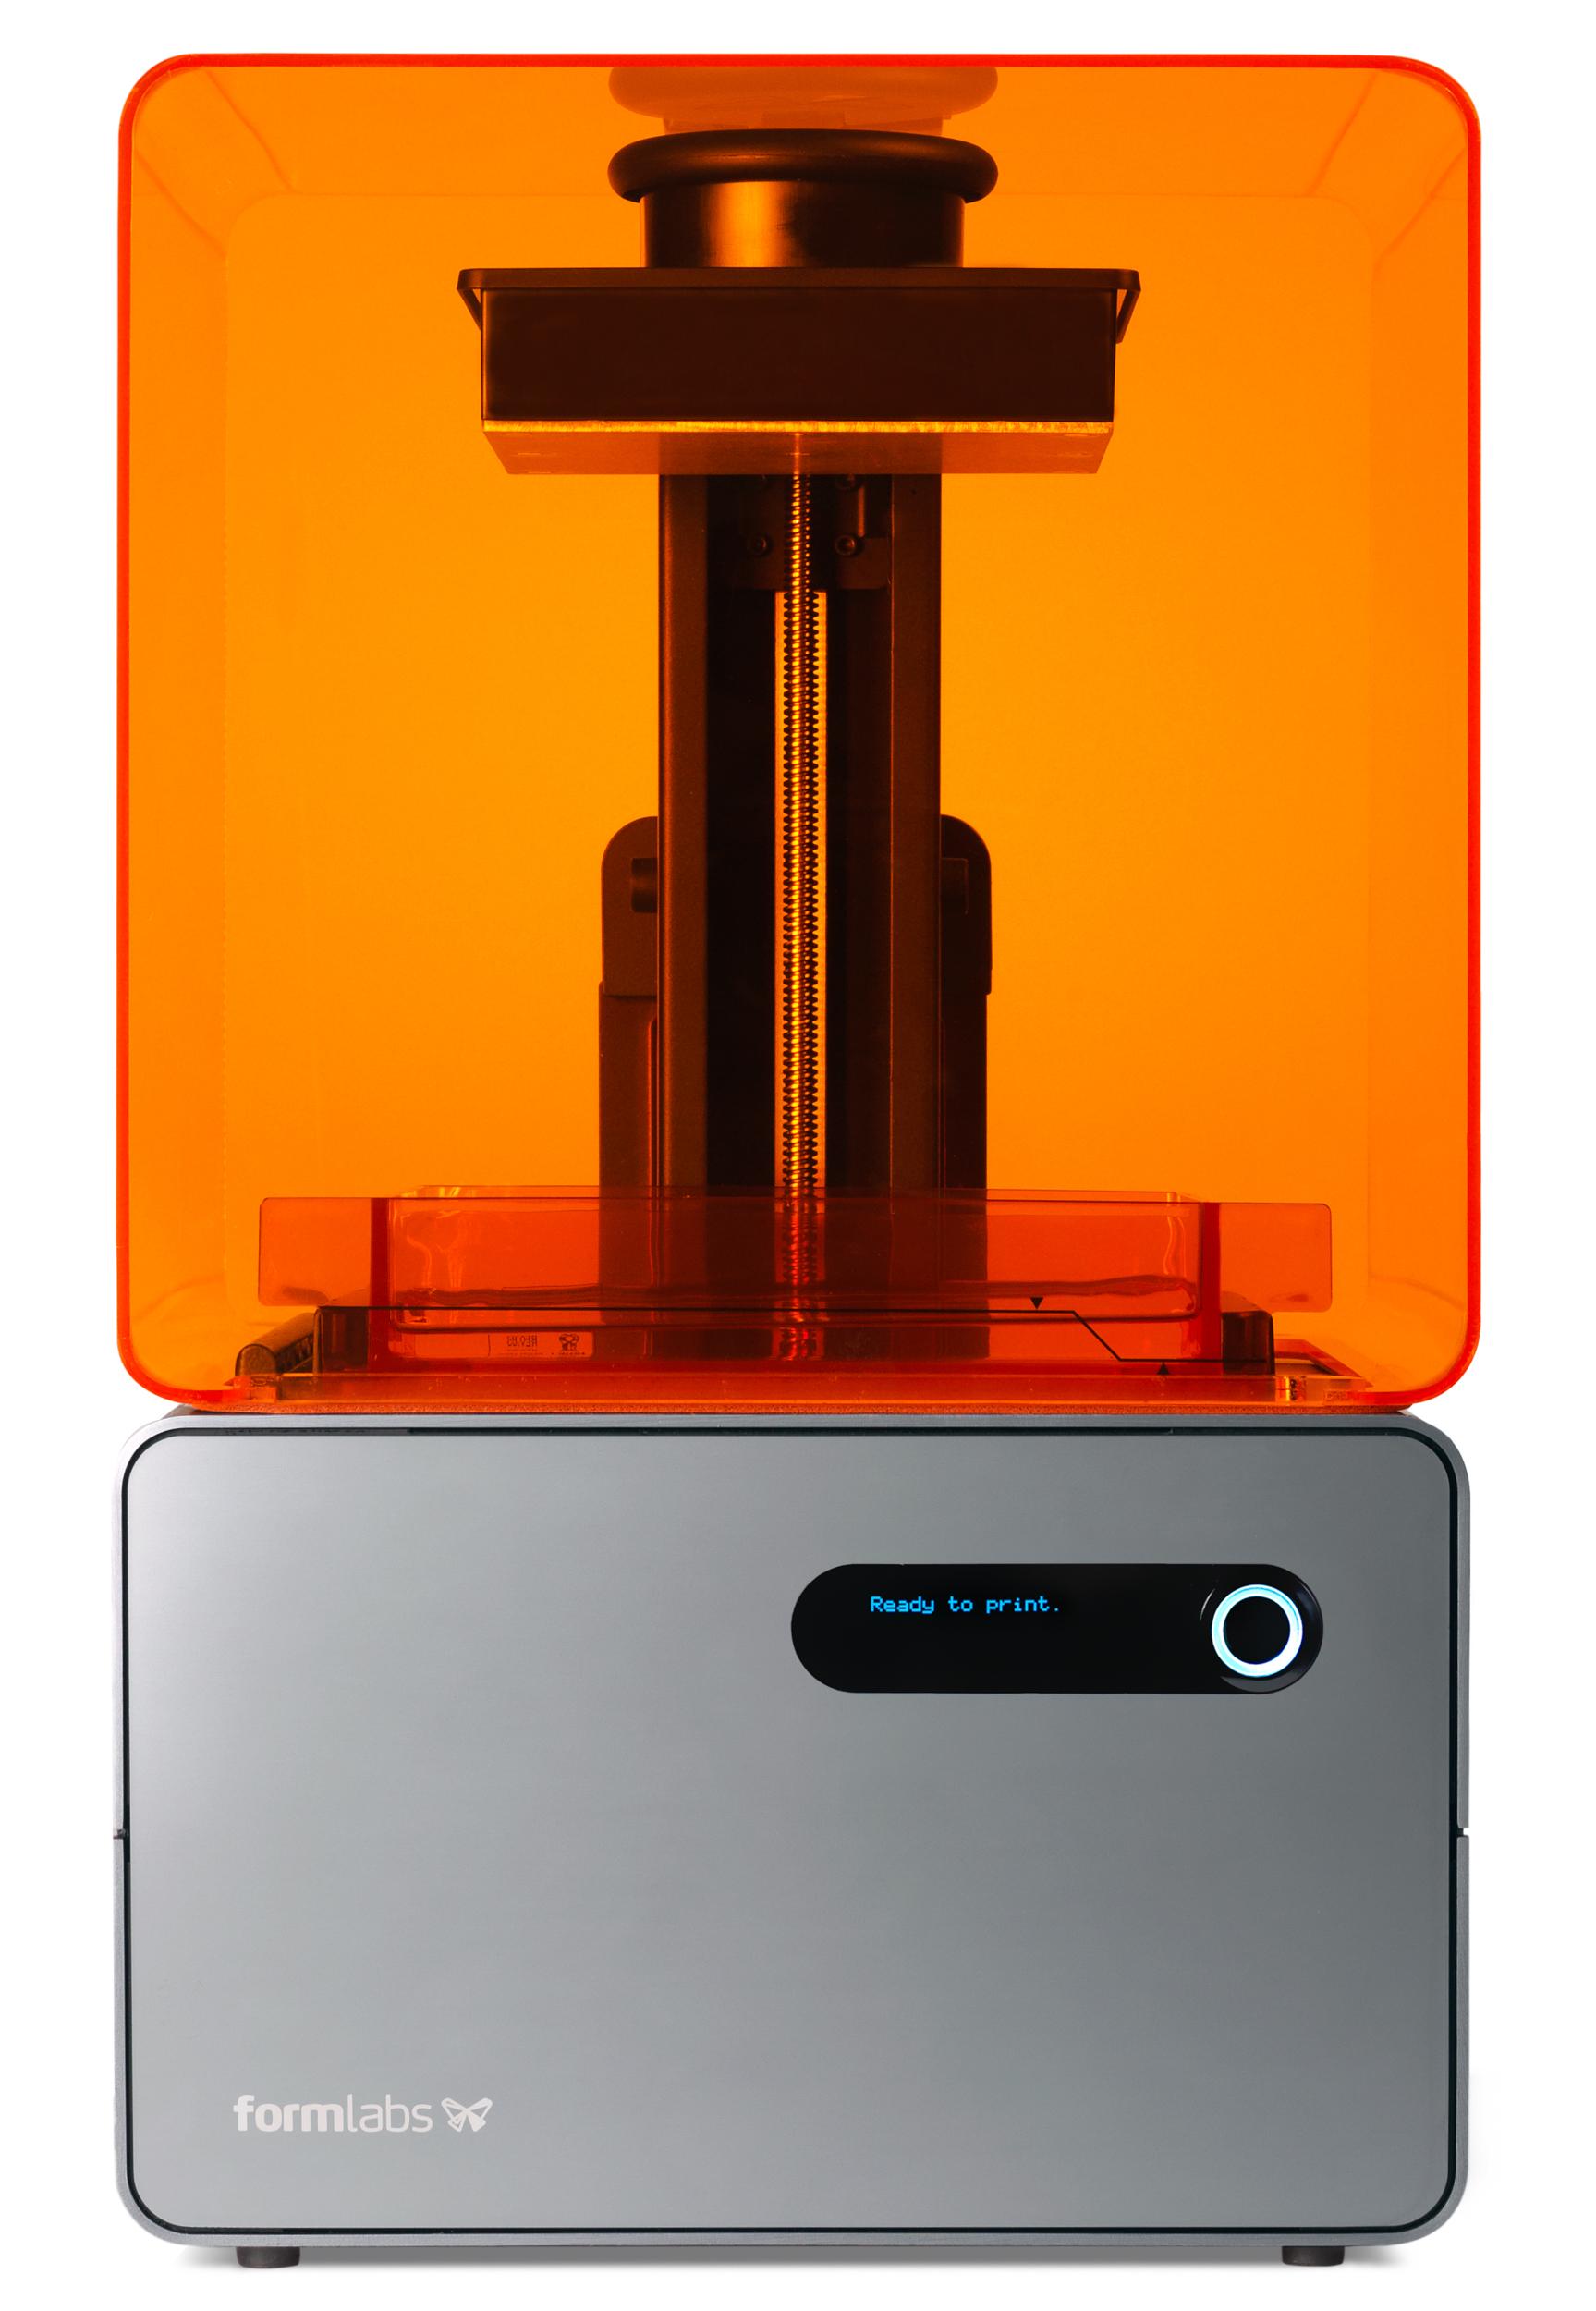 Faster, Finer: Formlabs Updates its Flagship 3D Printer